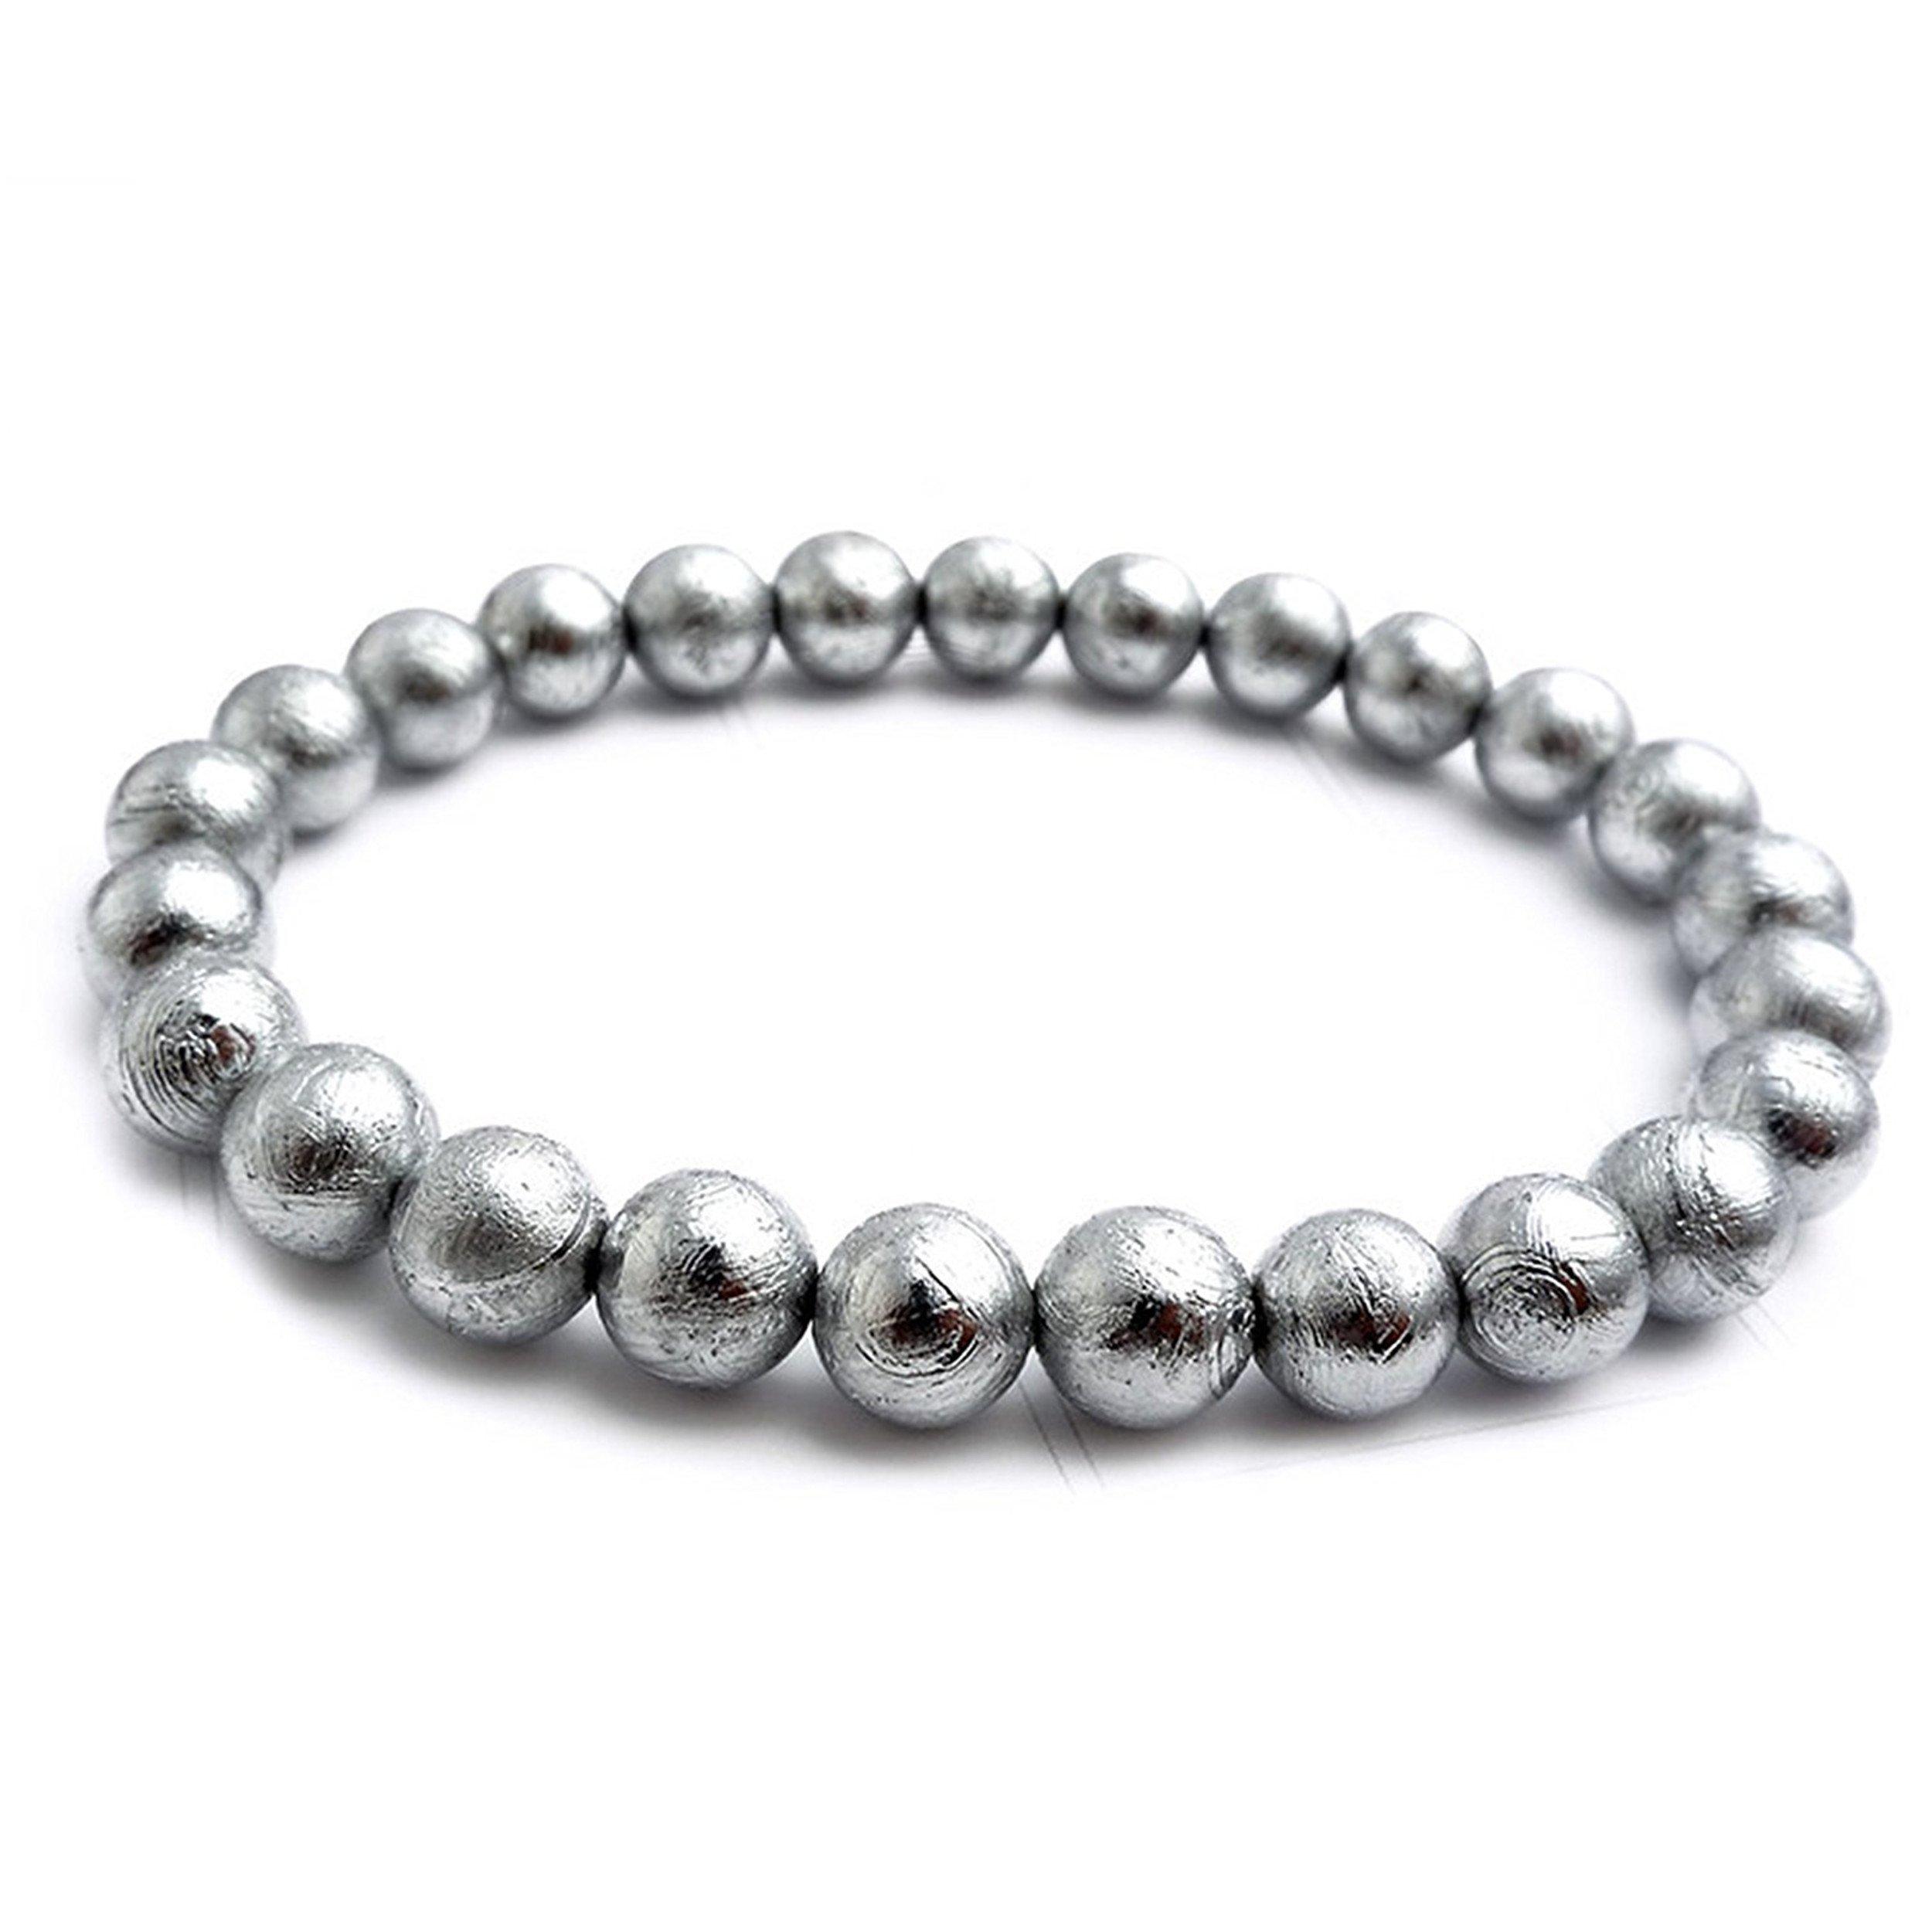 LiZiFang Natural Gibeon Iron Meteorite Round Bead Woman Mens Bracelet 6mm